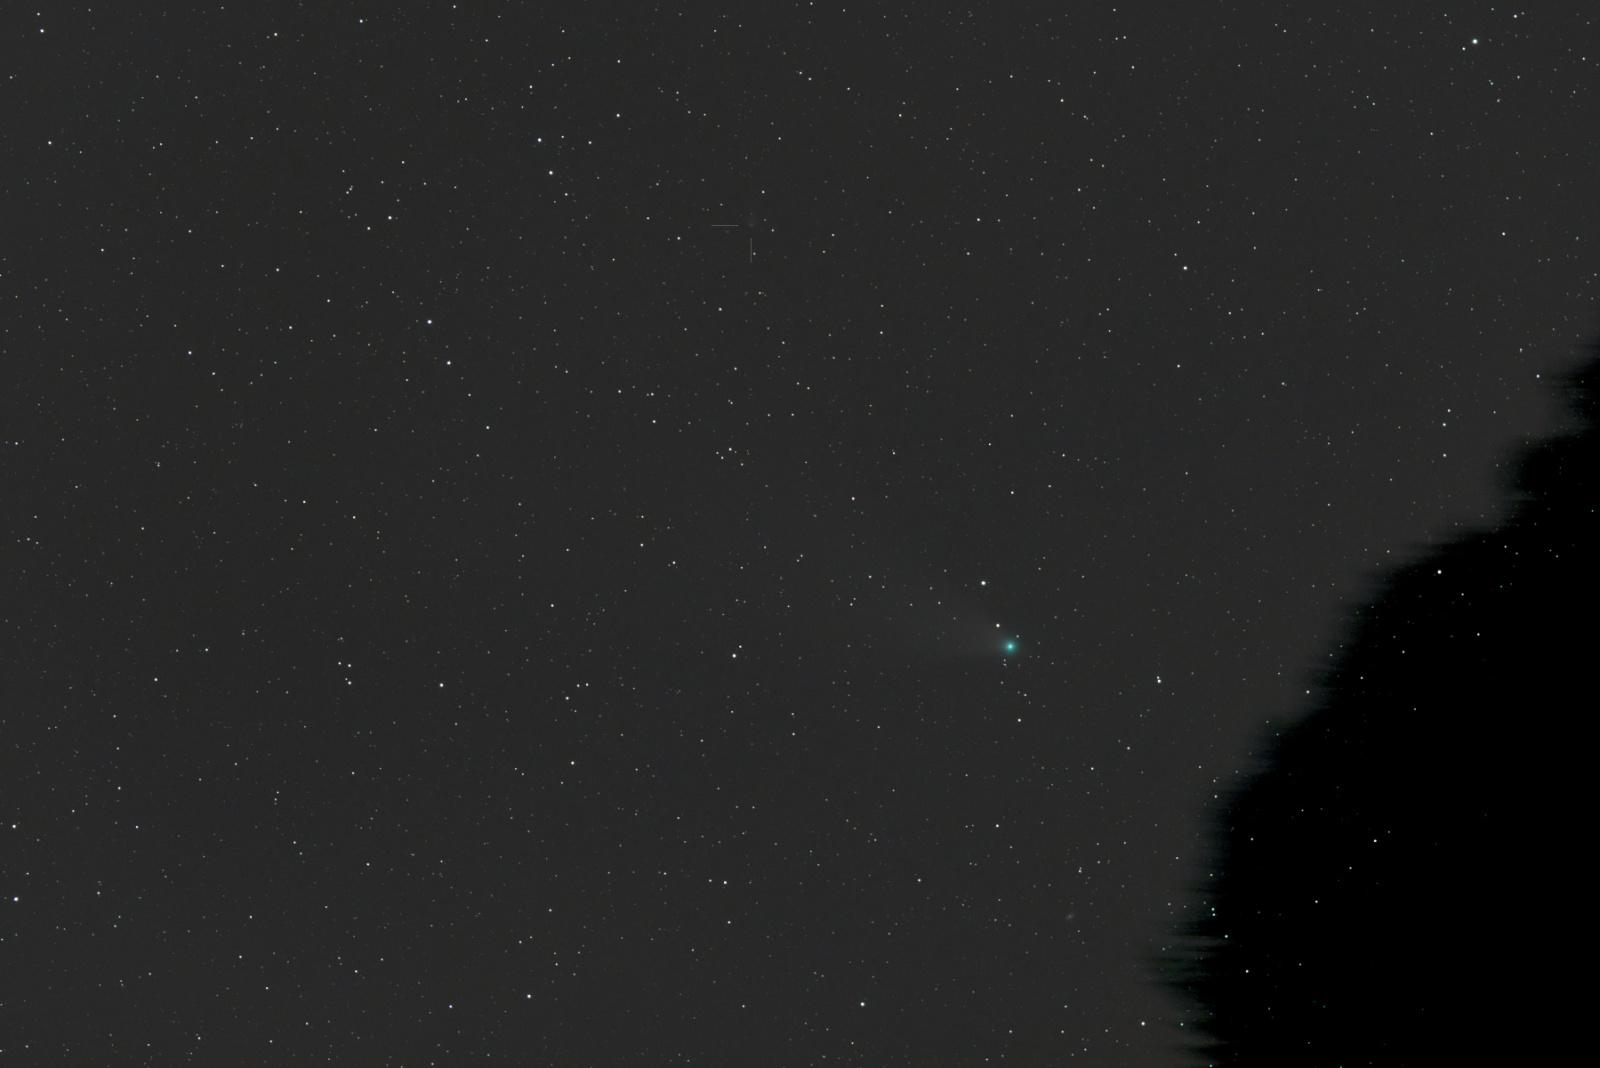 neowise_120820_noflat-RGB-session_1-lpc-cbg_filtered.jpg